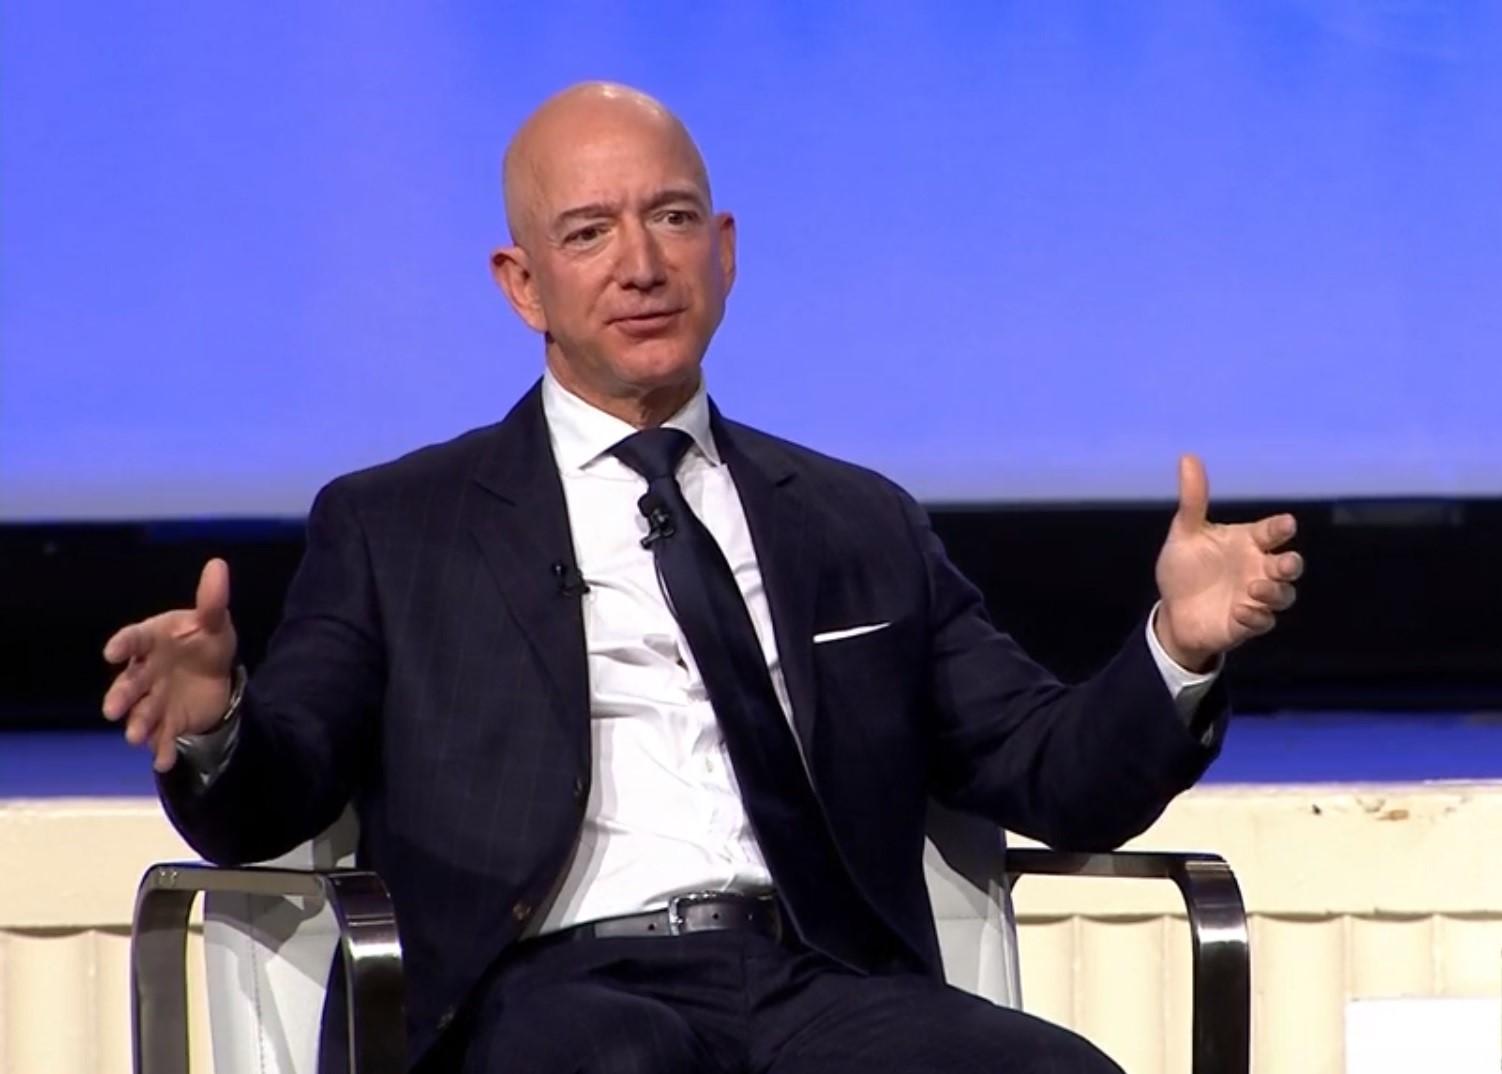 Full Transcript Jeff Bezos Shares High Flying Amazon Management Wisdom Geekwire